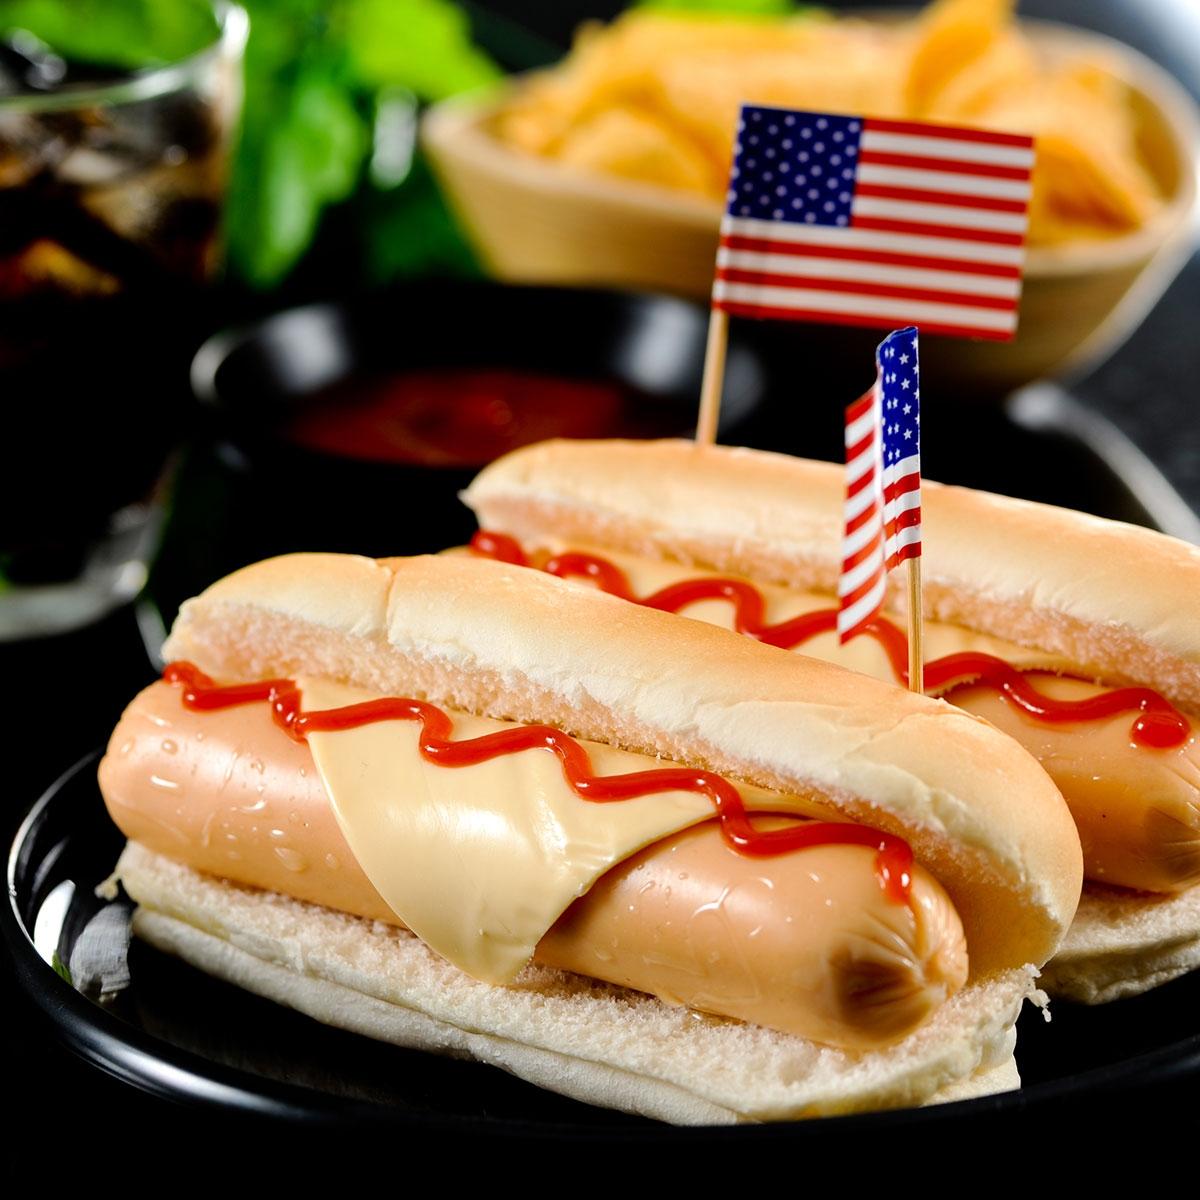 National Hot Dog Day 2019